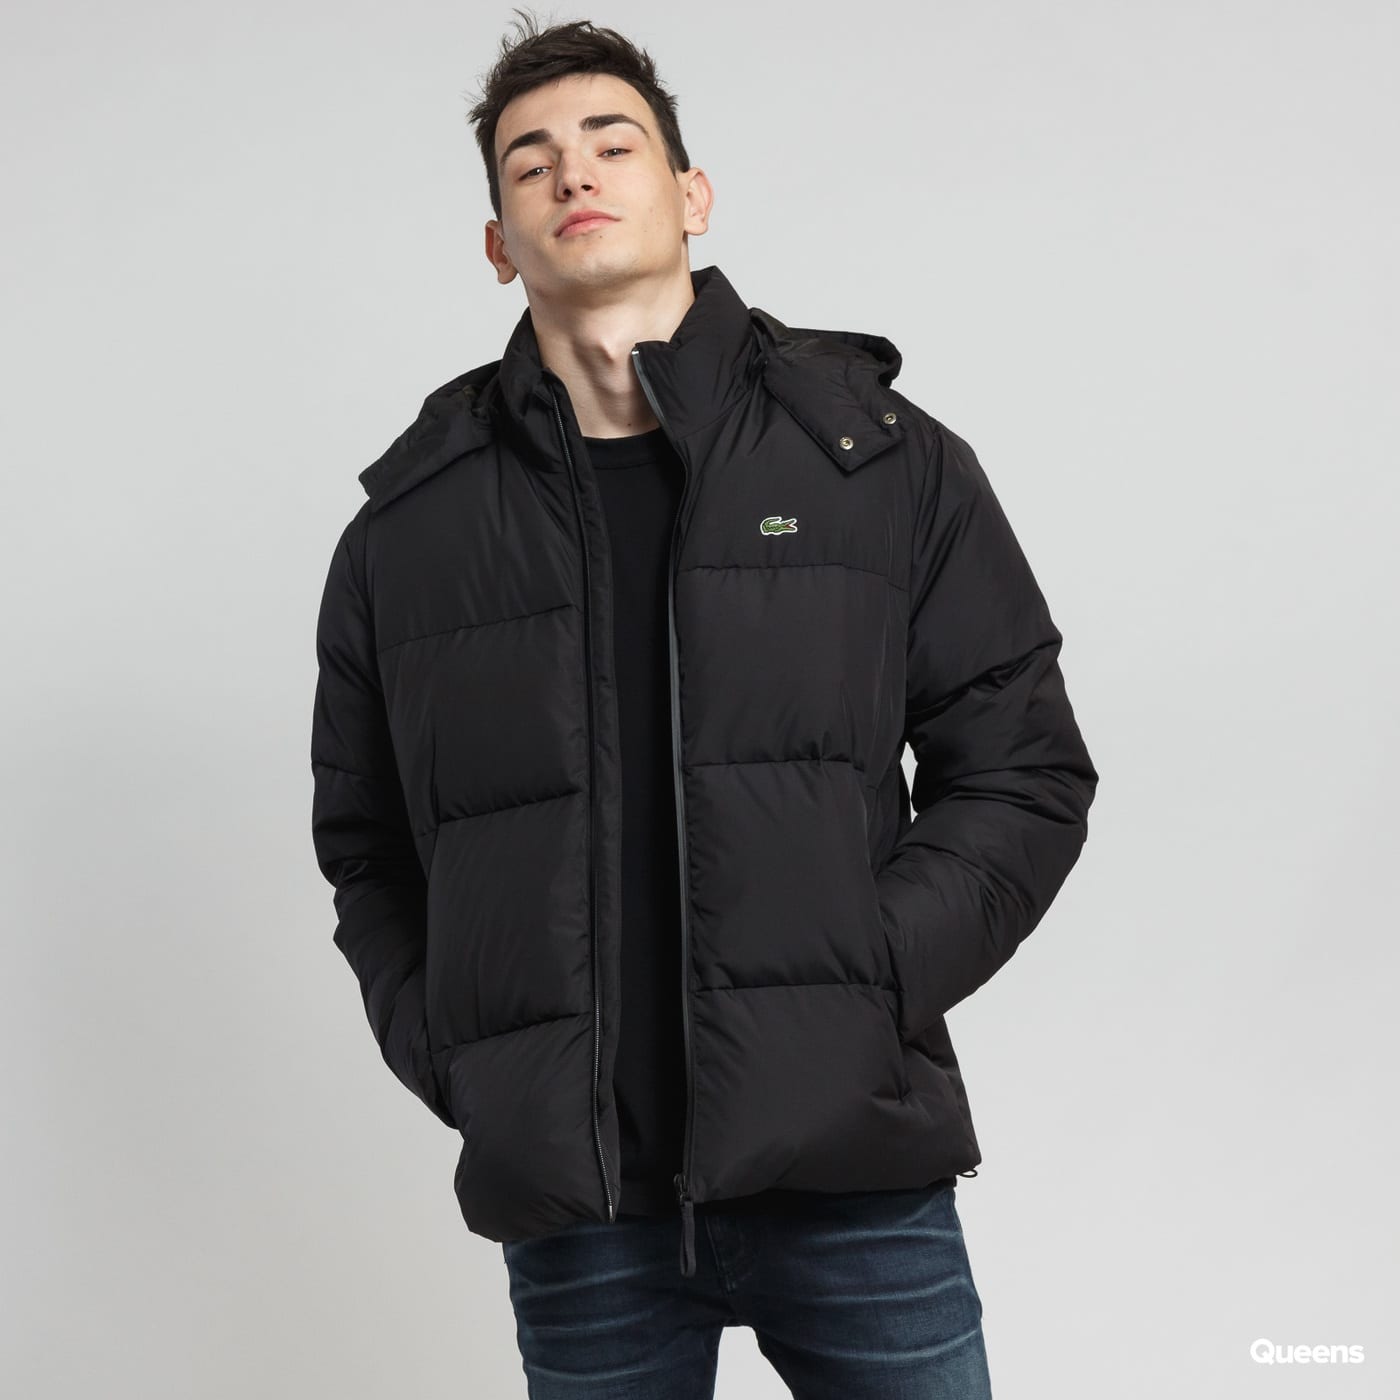 2477d616ab7 Pánská zimní bunda LACOSTE Puffer Jacket (BH9358) – Queens 💚